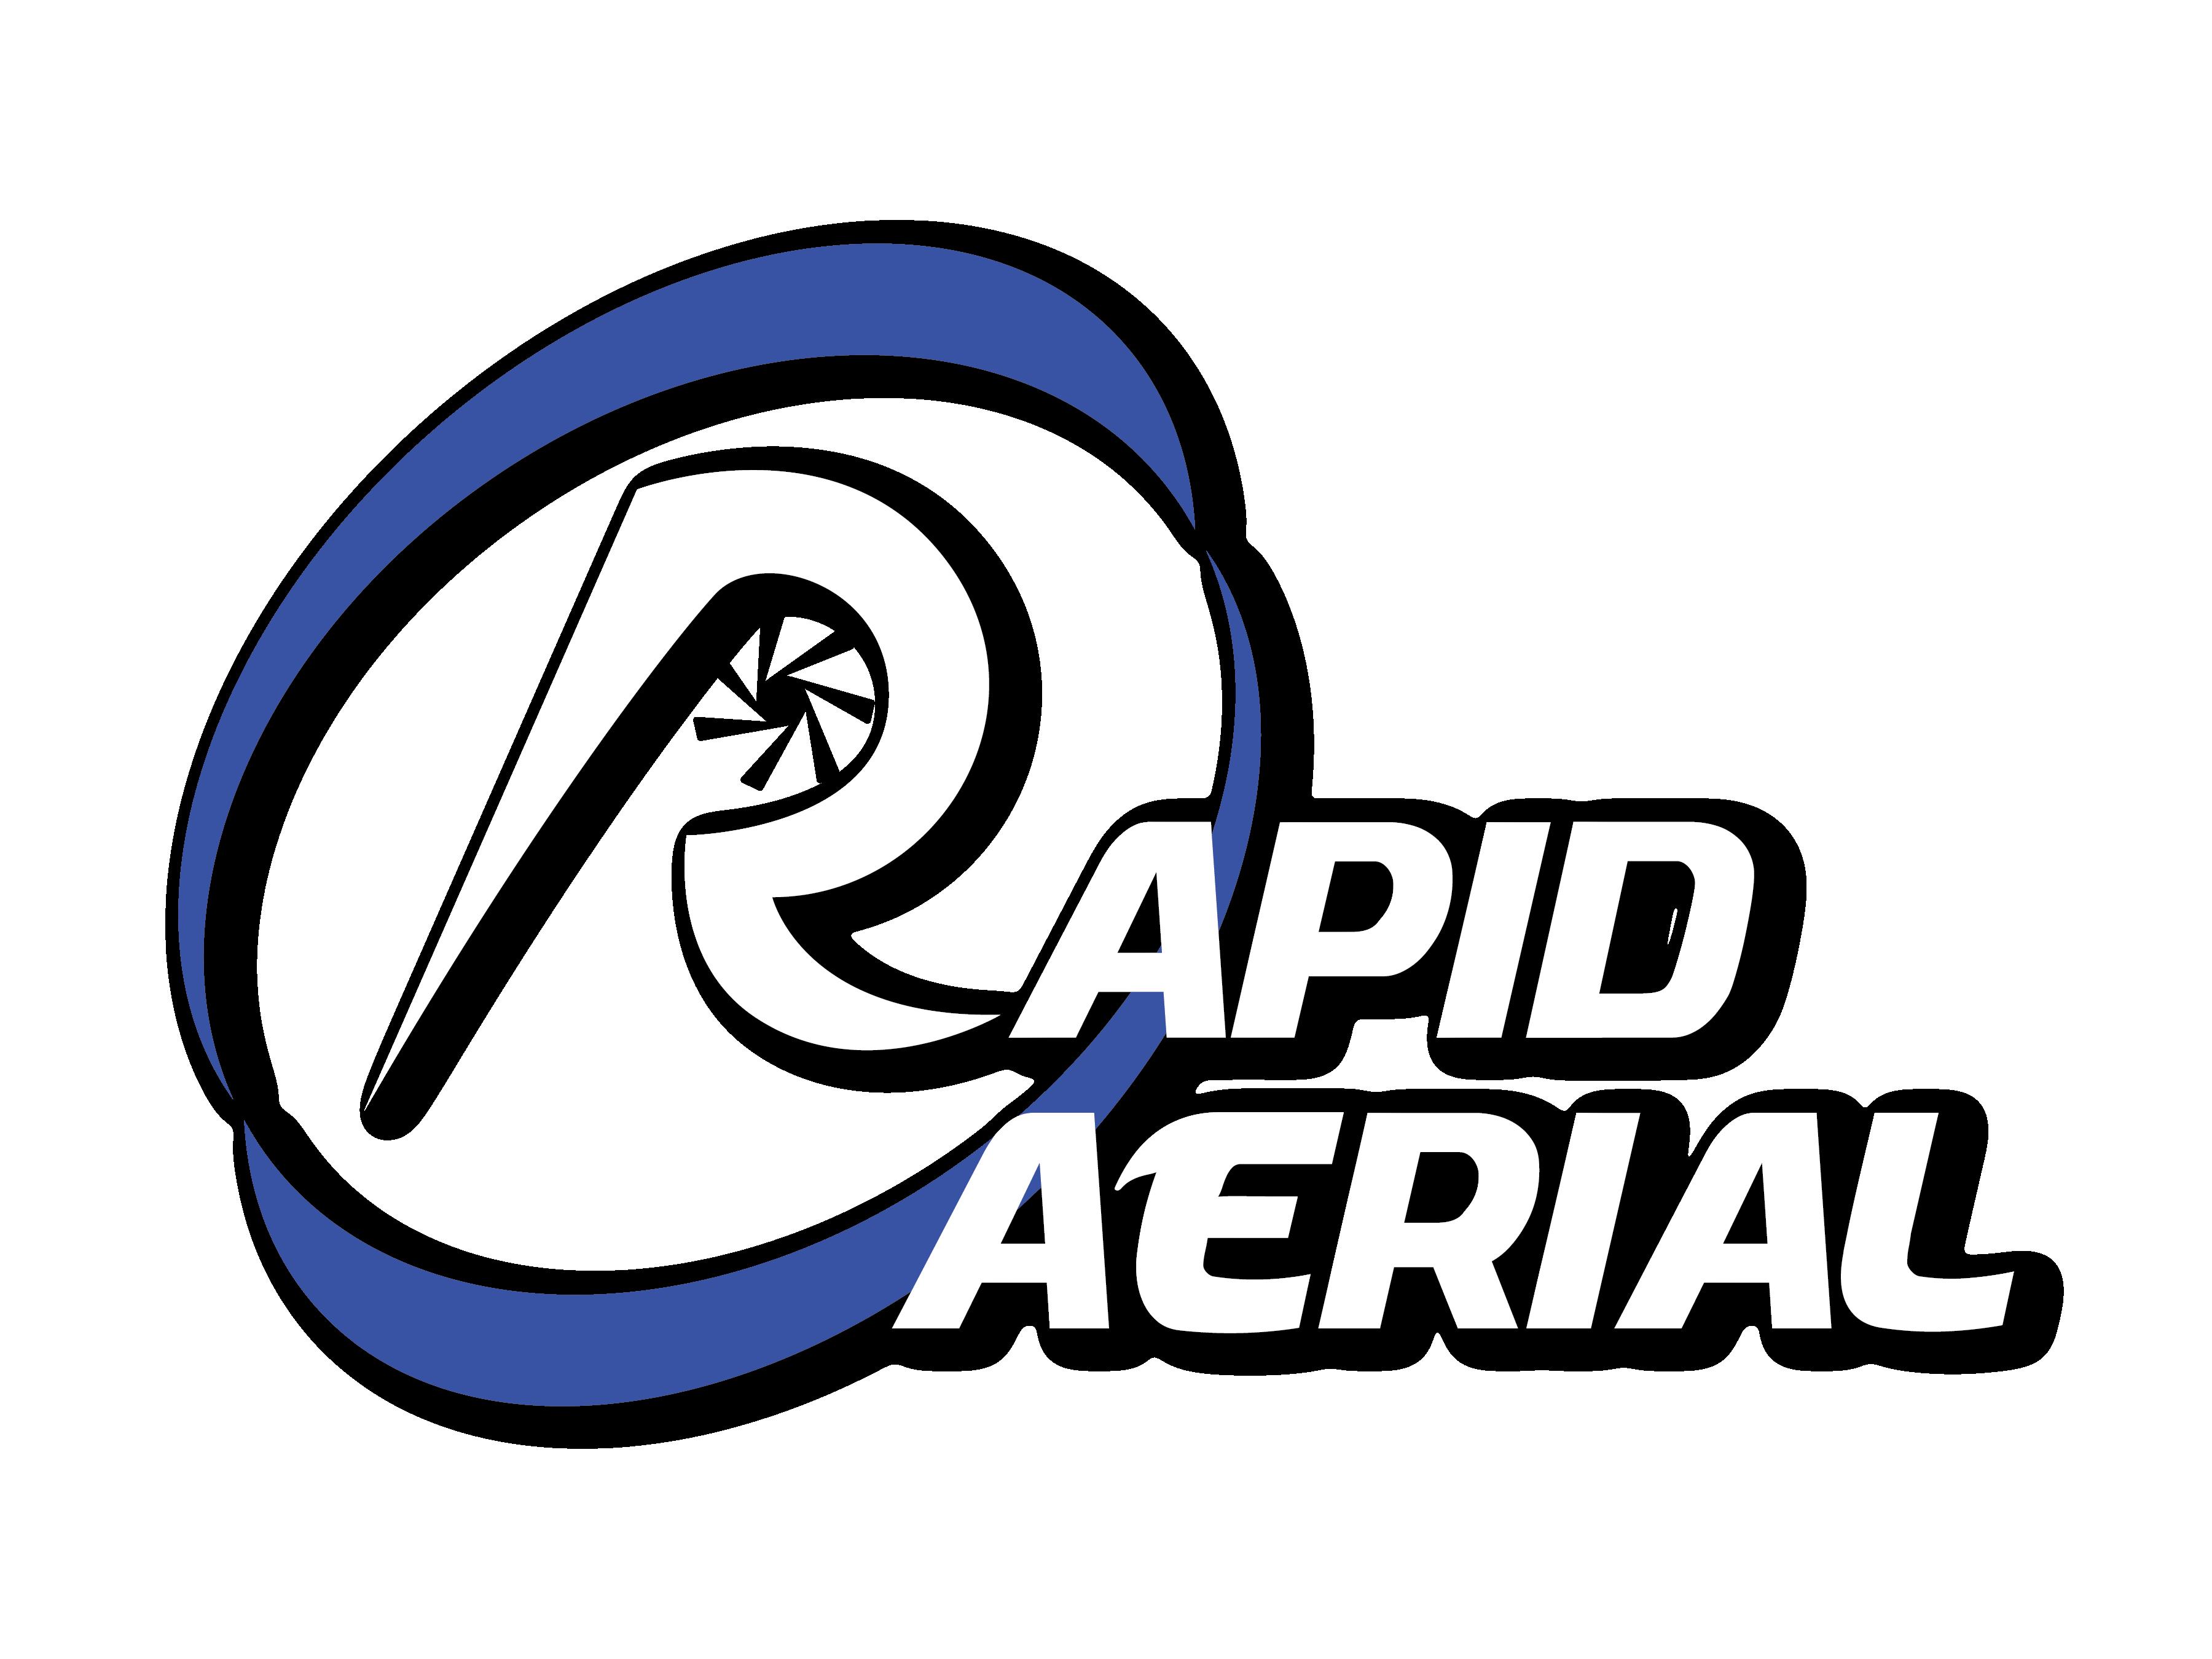 Rapid Aerial